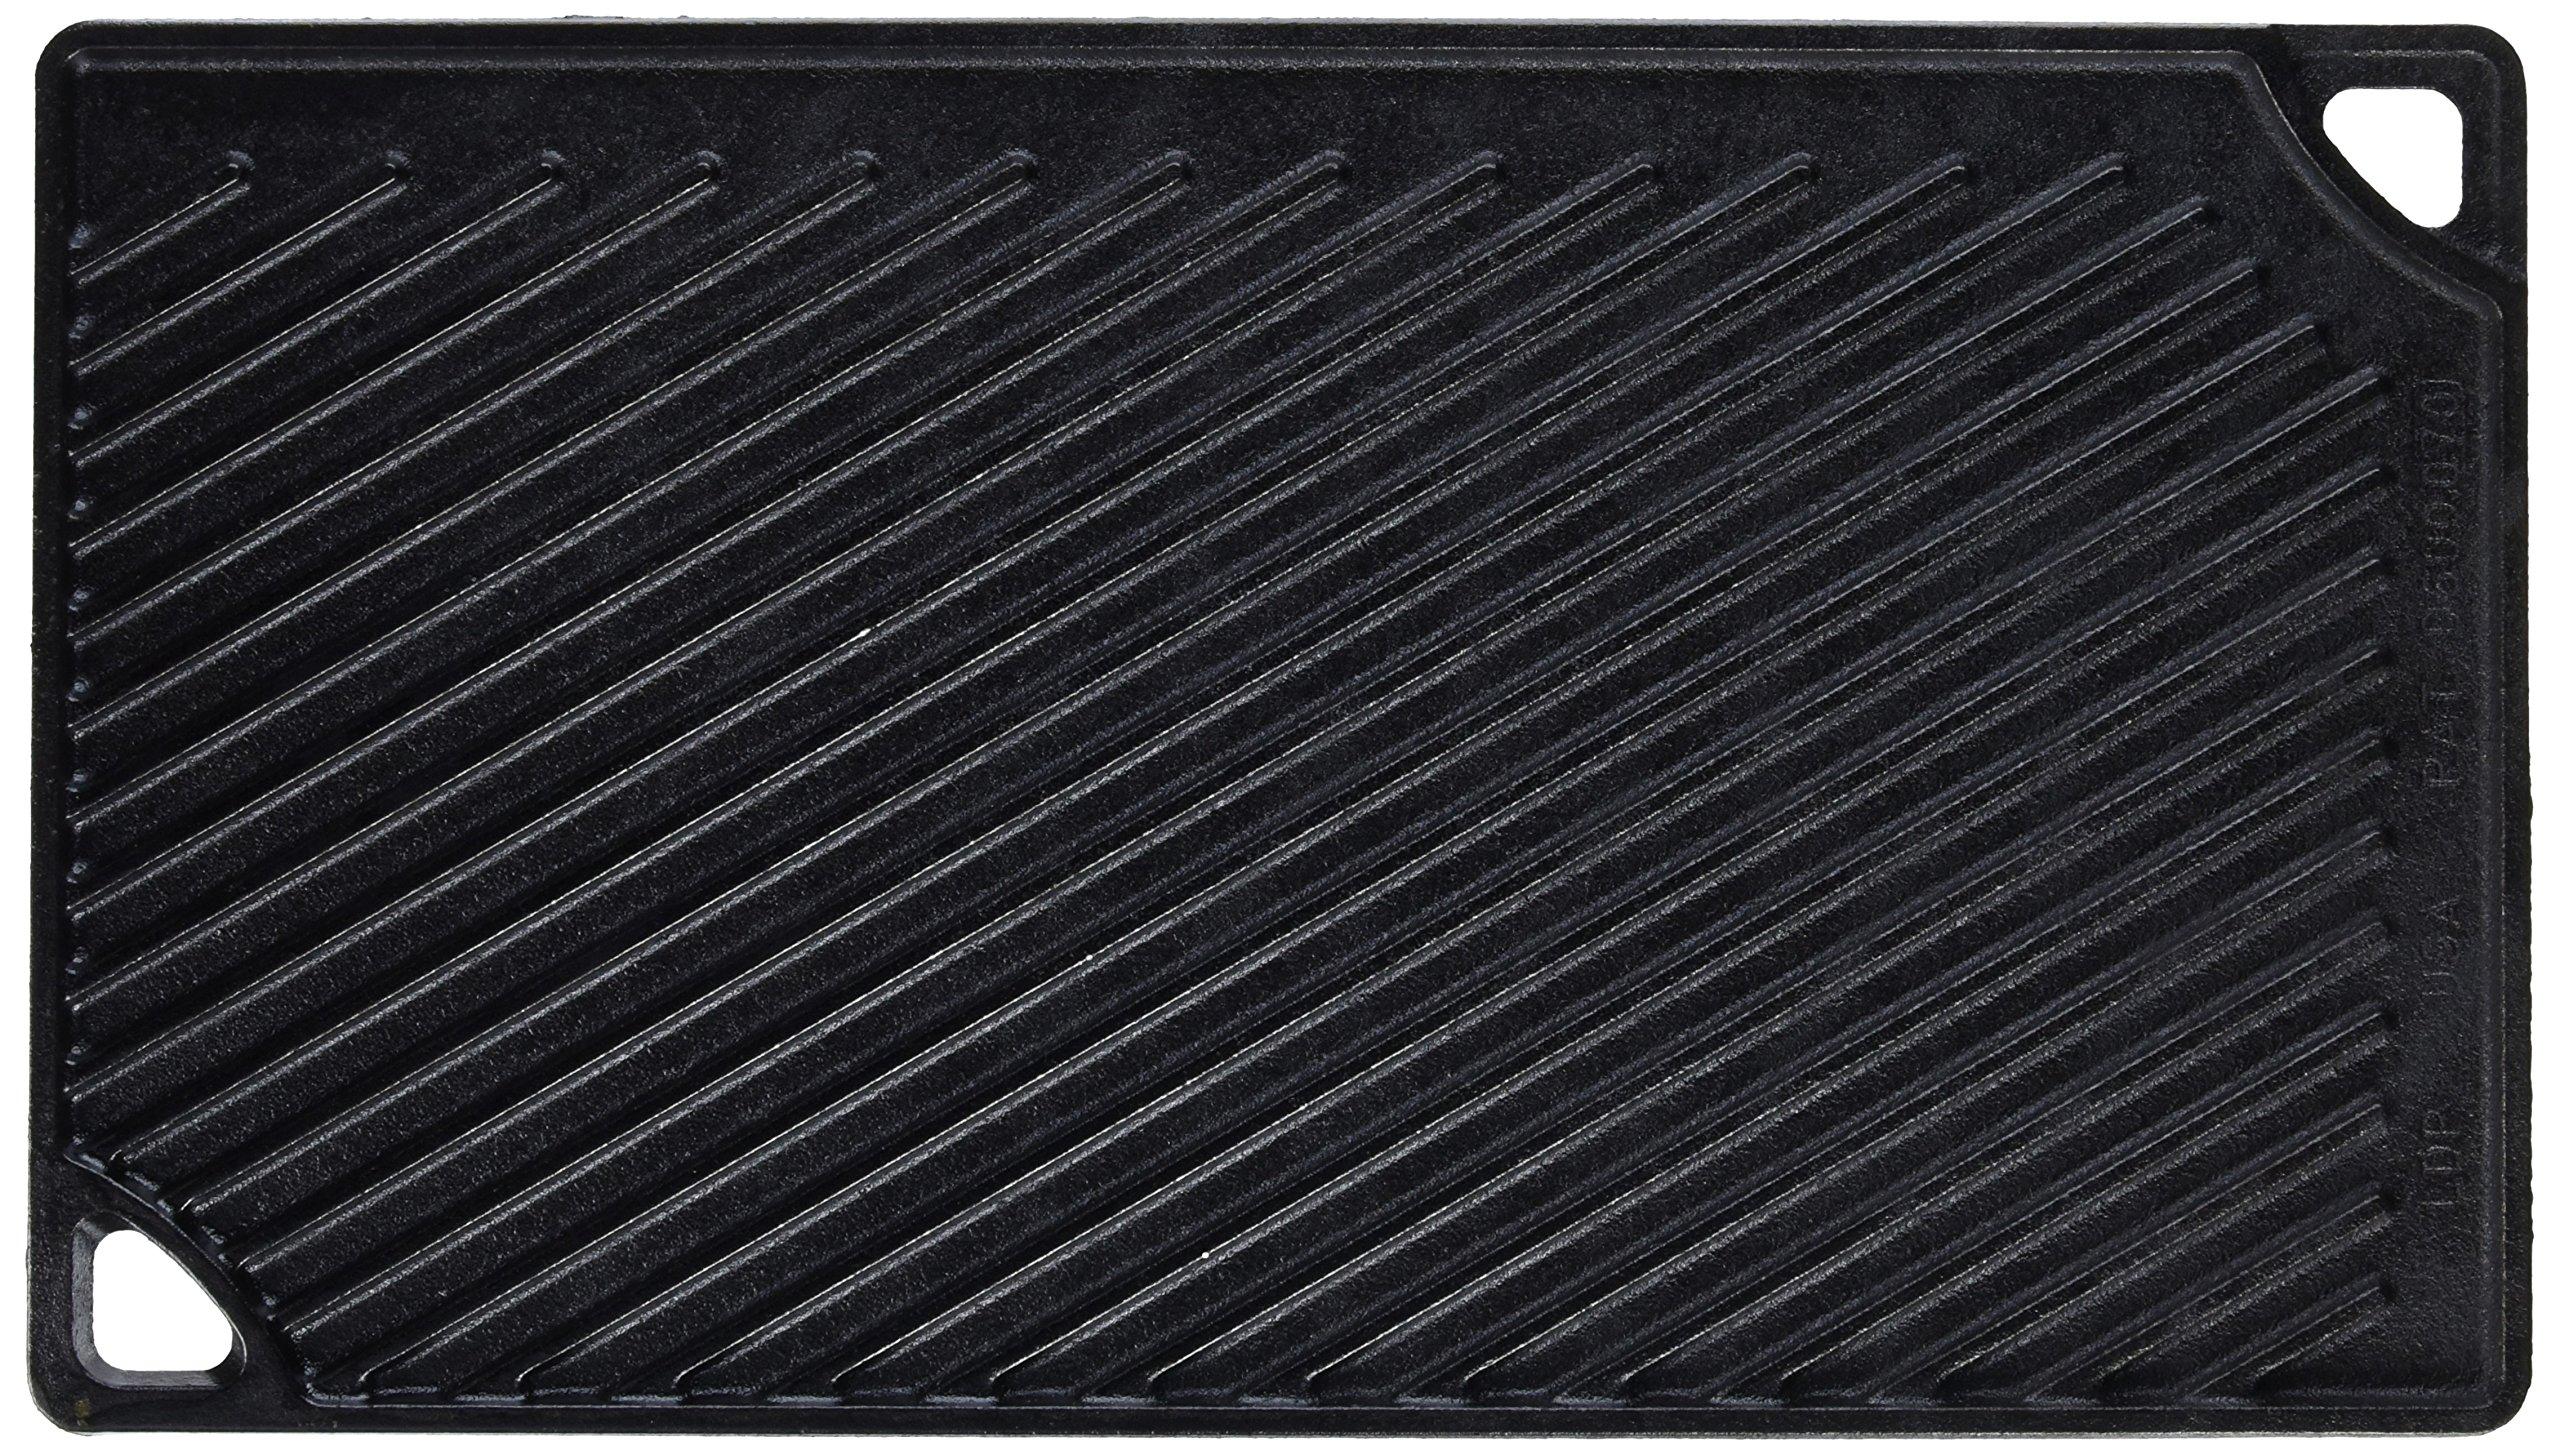 Lodge LDP3 42.55 x 24.13 cm / 16.75 x 9.5 inch Pre-Seasoned Cast Iron Rectangular Reversible Grill / Griddle, Black